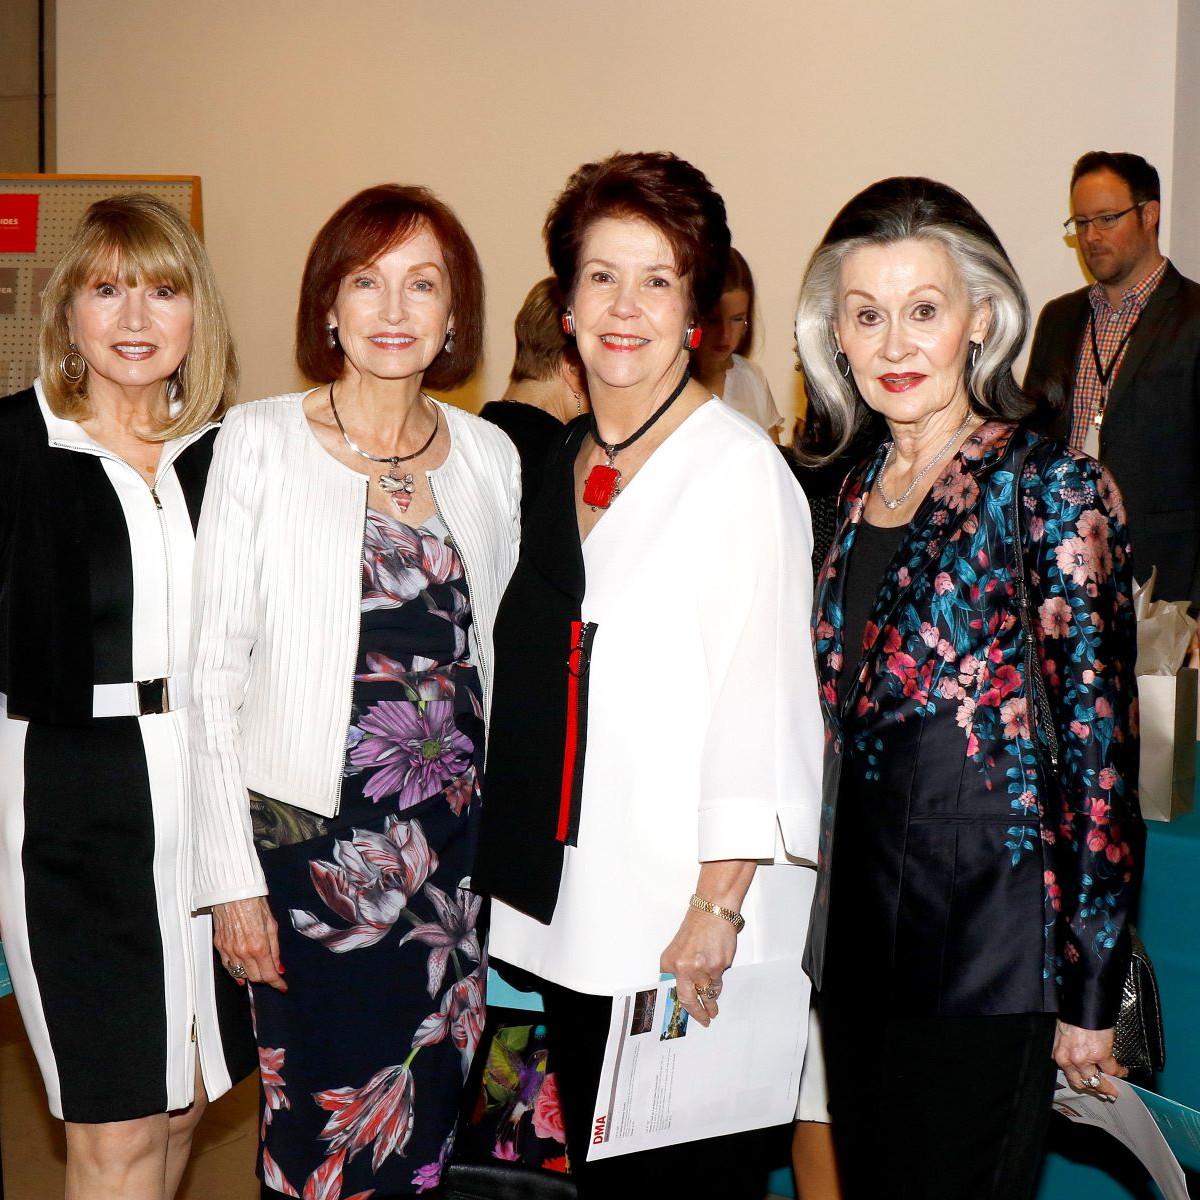 Susan Cooper, Sharon Gleeson, Judy Dryden, Libbie Wilmer